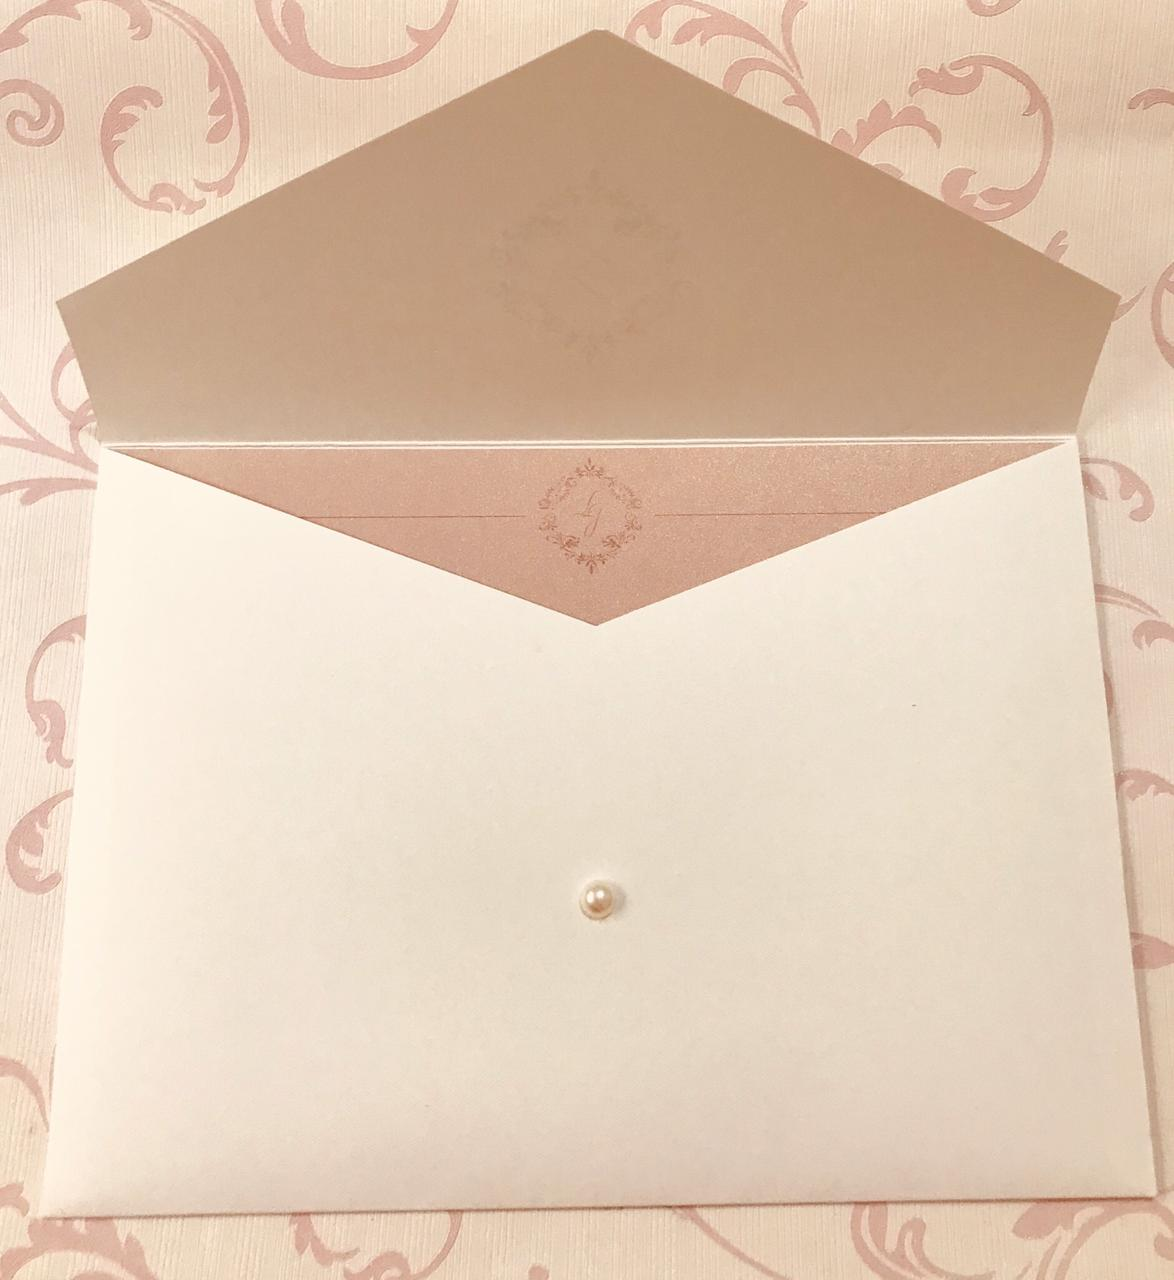 Convite de Casamento Papel Nude Brilhante com Envelope